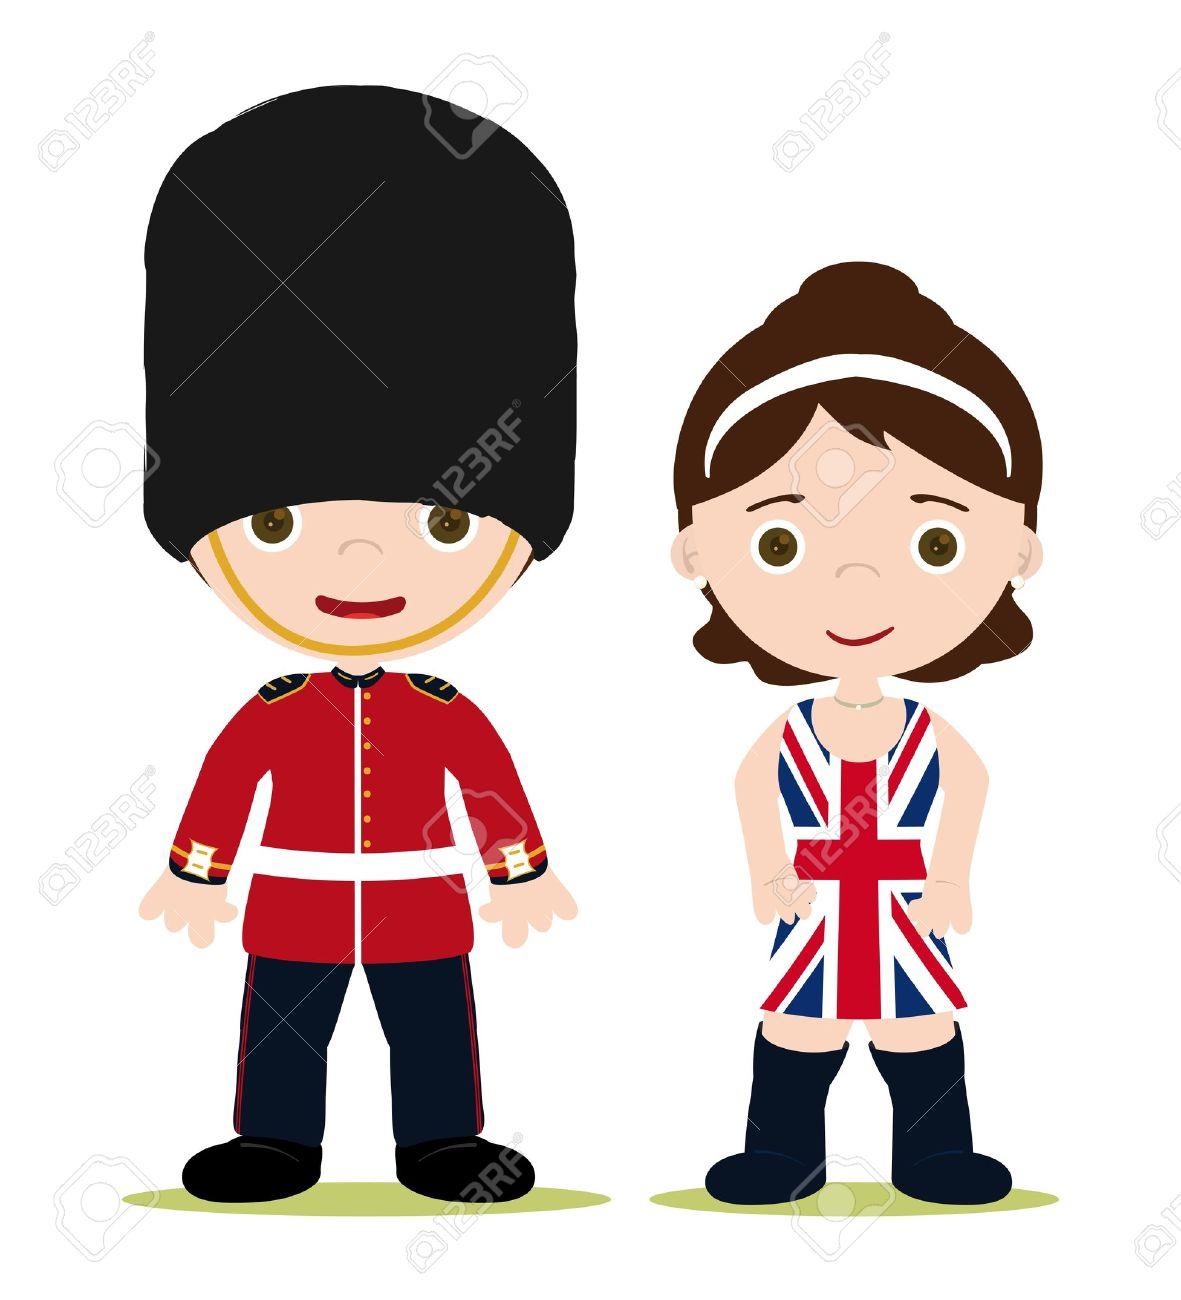 England Royal guard and girl with Union Jack dress - 16428924